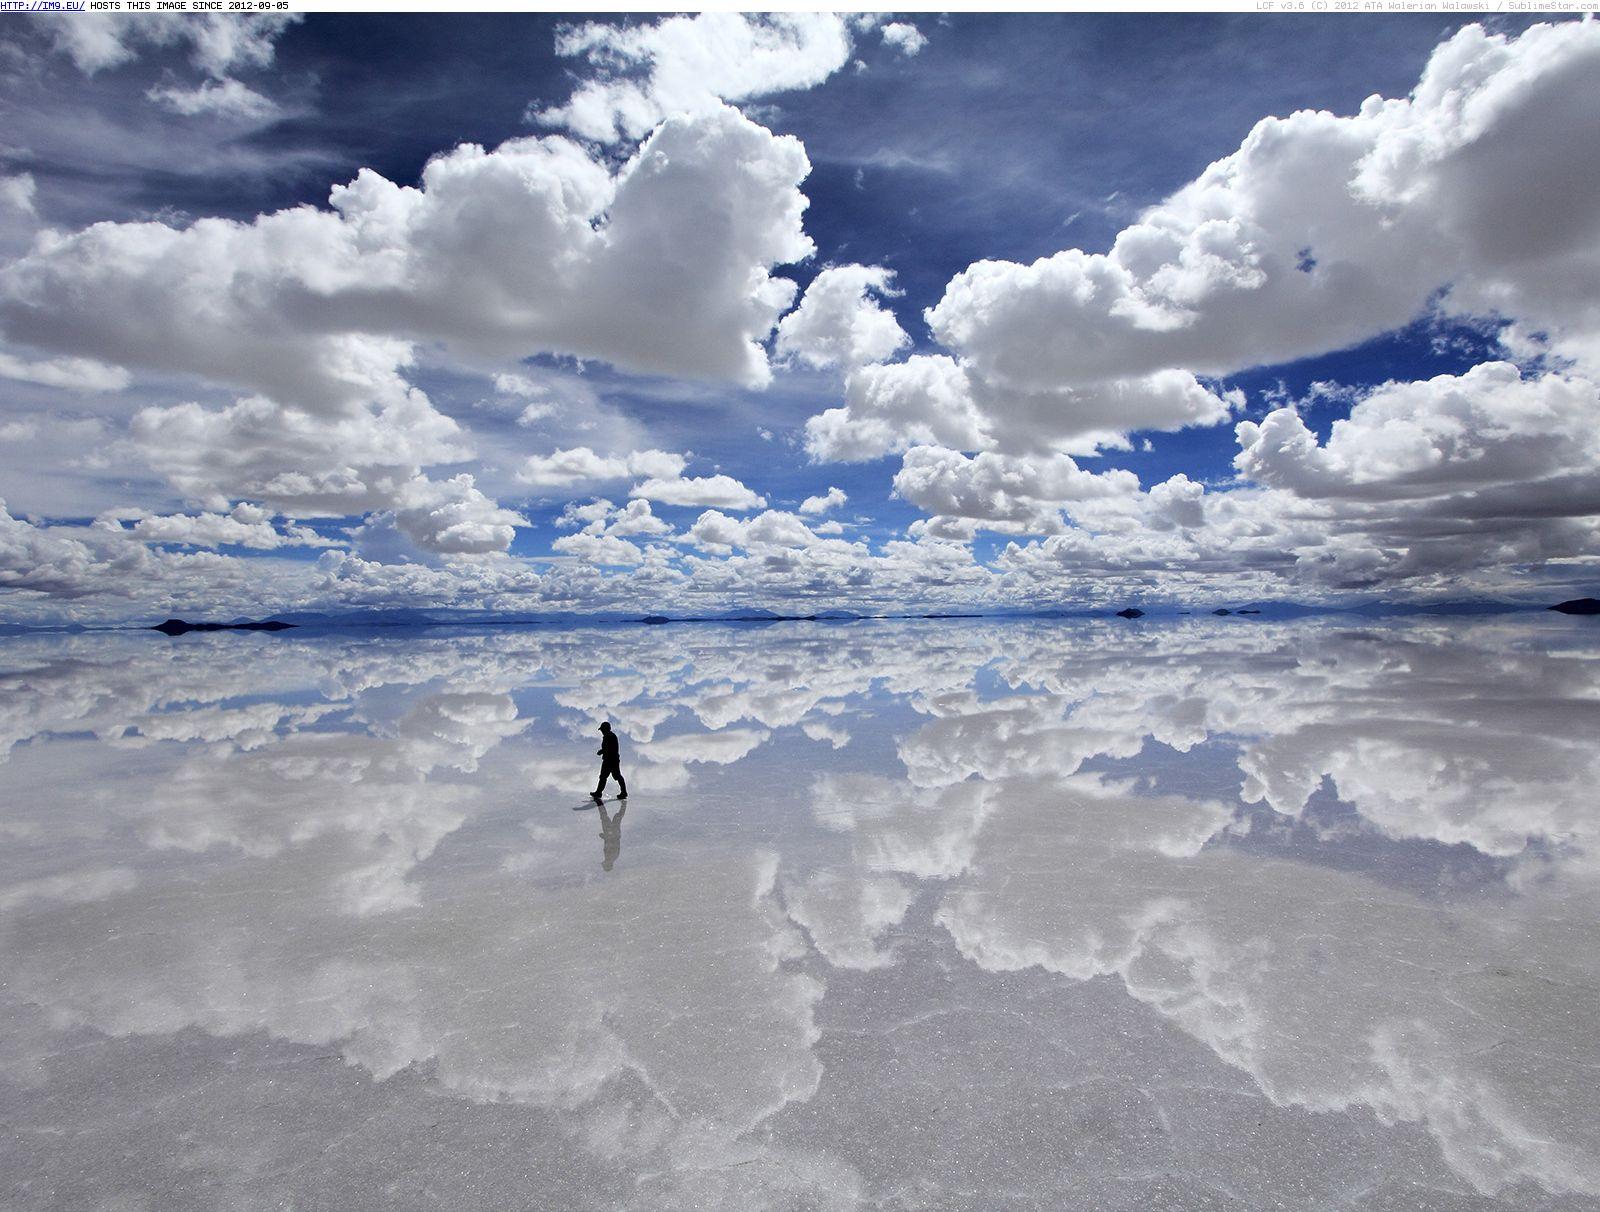 salar-de-uyuni-is-the-worlds-largest-salt-secret-world